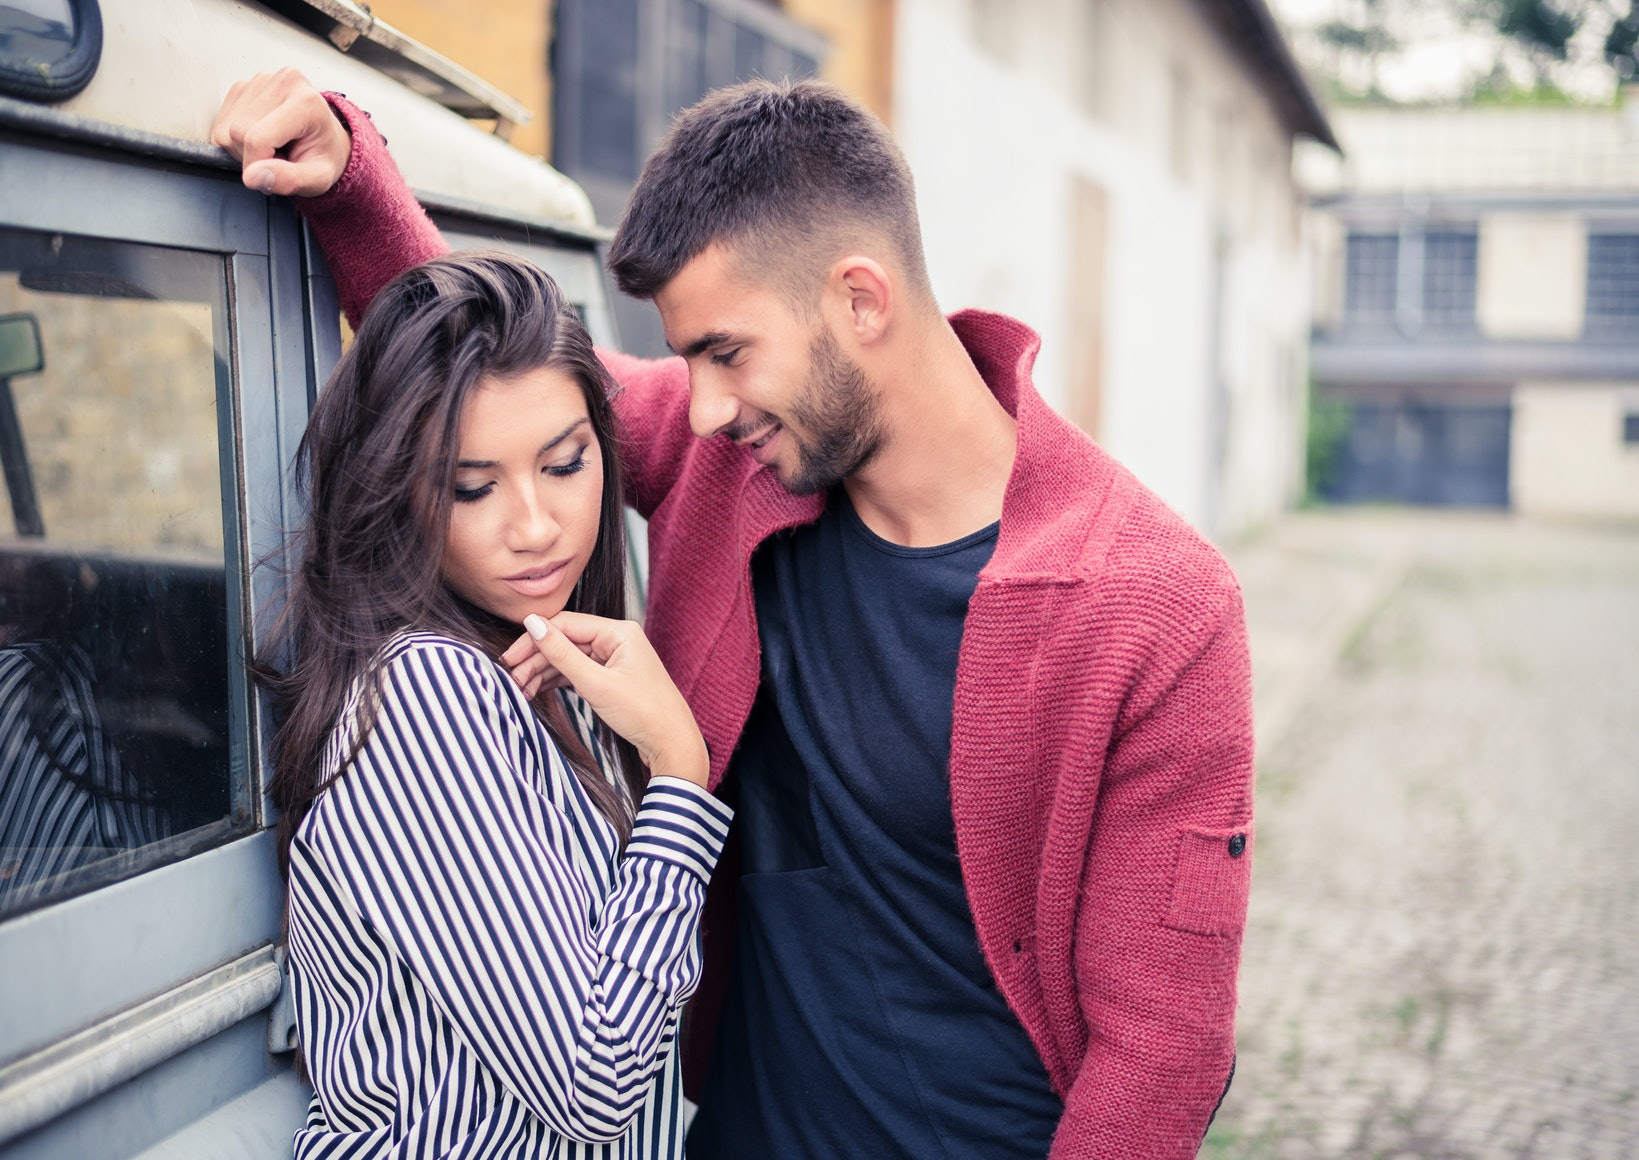 define chivalry in dating